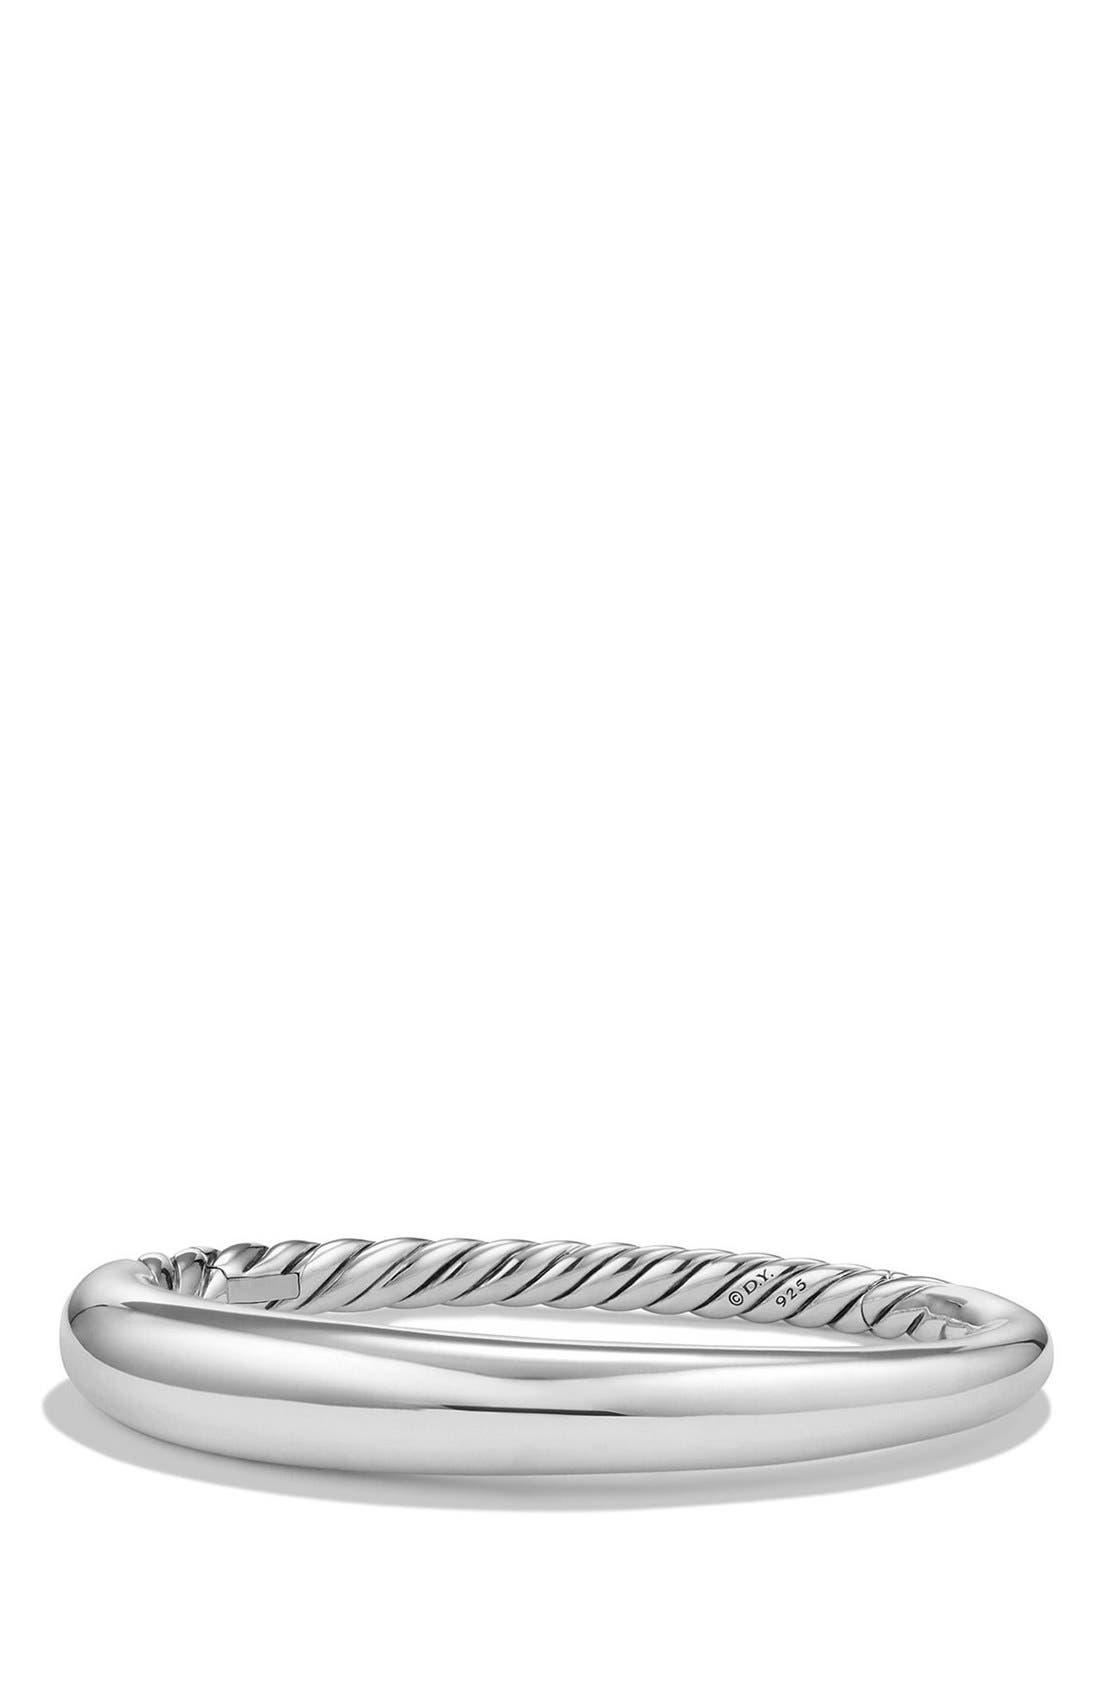 DAVID YURMAN Pure Form Small Sterling Silver Bracelet